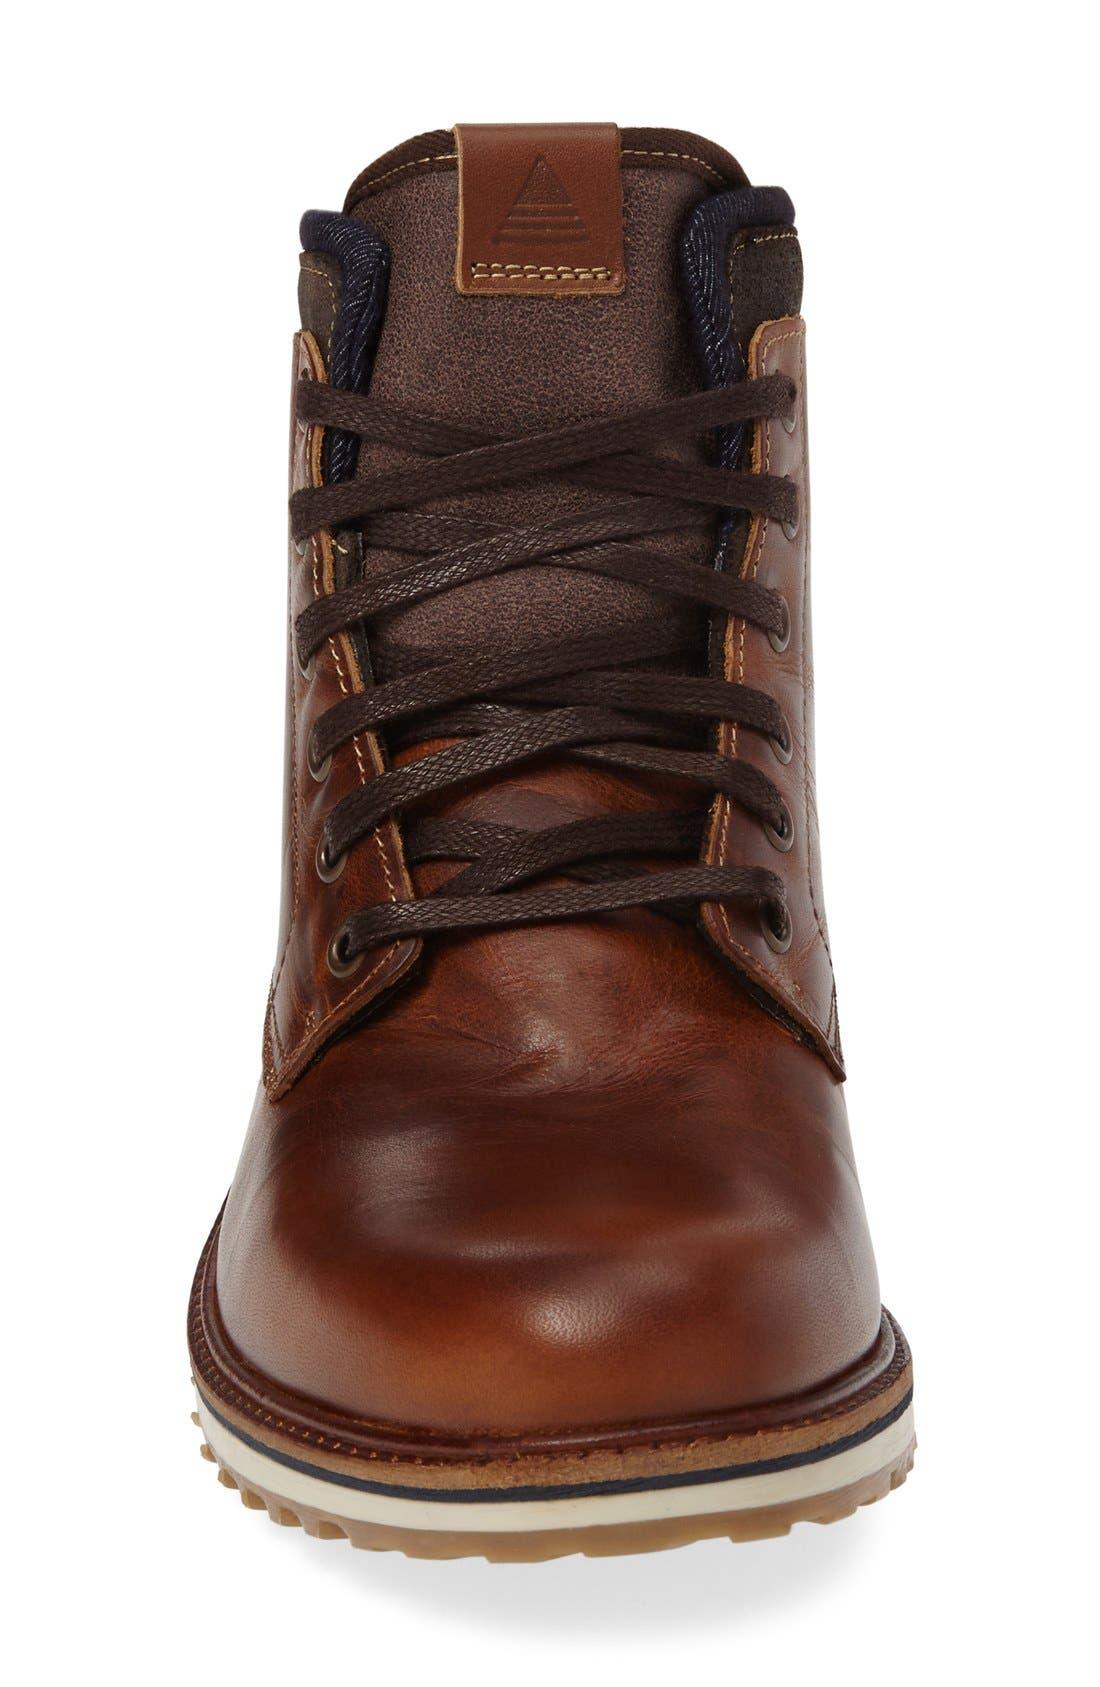 Qorellan Plain Toe Boot,                             Alternate thumbnail 3, color,                             240